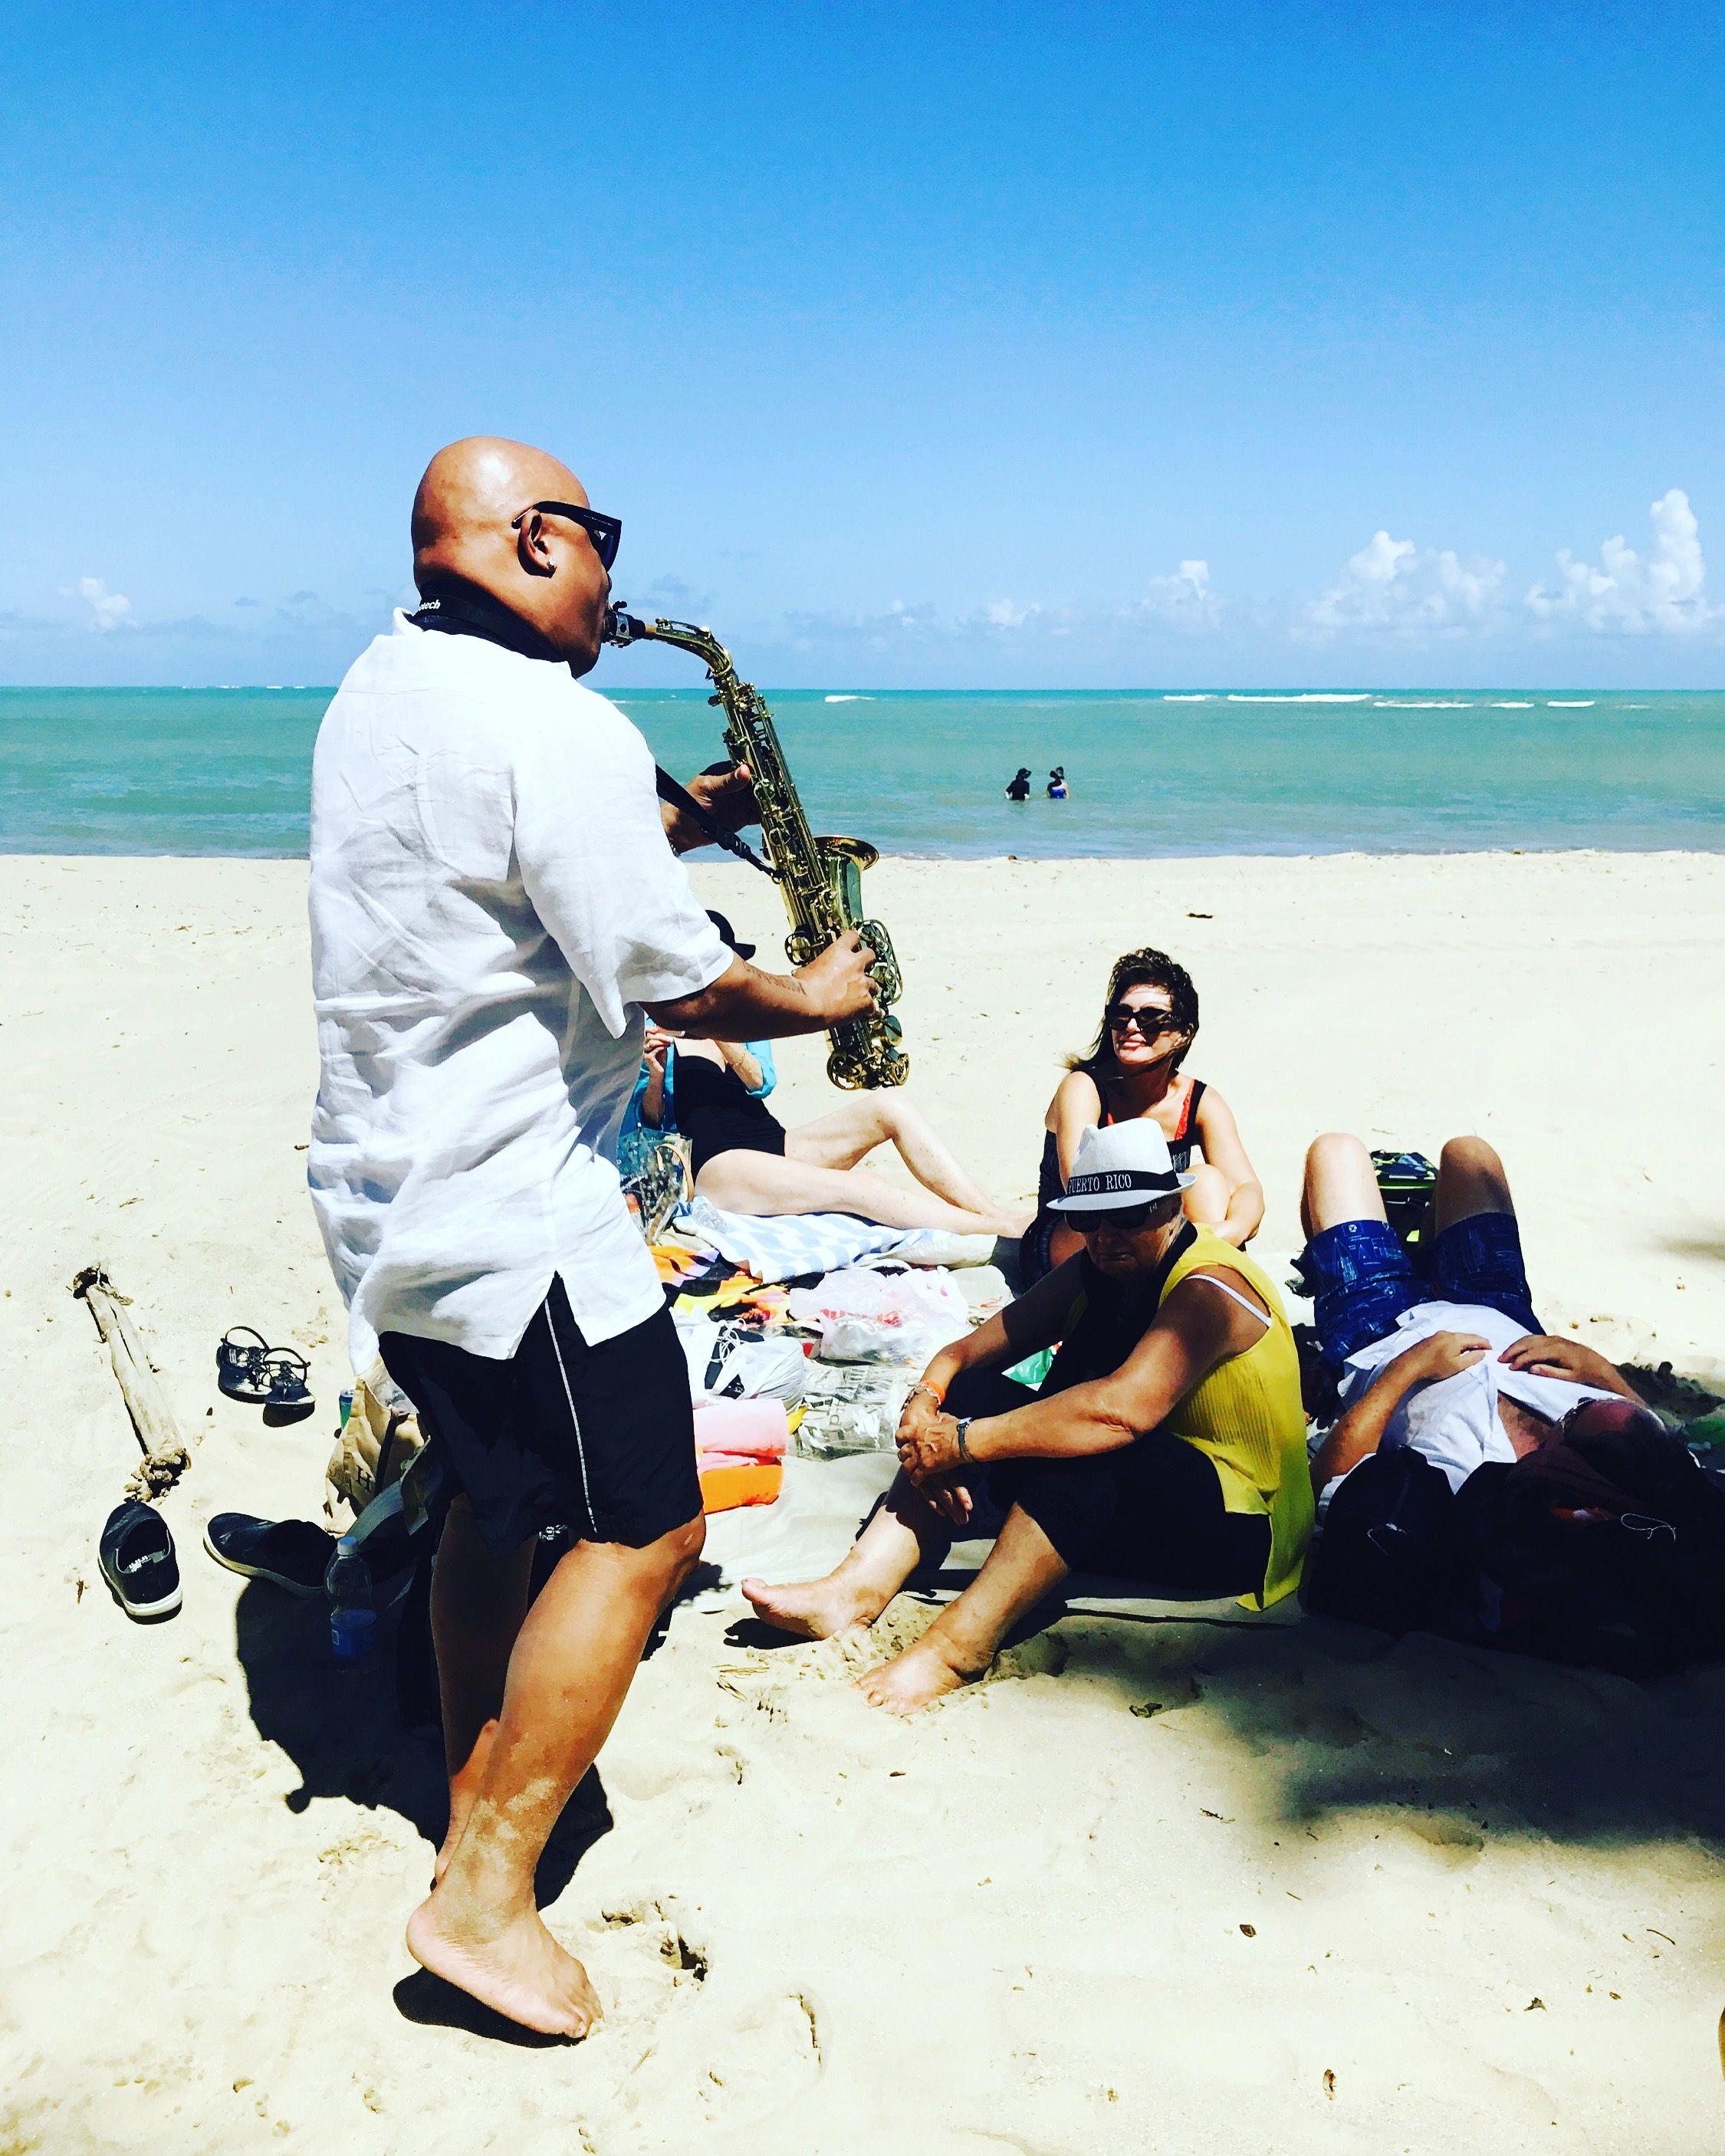 I decided to do a little jam at this @privatebeach  @skijohnsonlive @sanjuan @puertorico #privatebeach #sanjuan #puertorico #letsgo #champagne #sanjuanbay #beach #sunset #living #love #beautiful #jazz #awesome #saxophone #photooftheday #amazing #followme #picoftheday #like  #smile #look #skijohnsonenterprises #bestoftheday #style #happy #fun